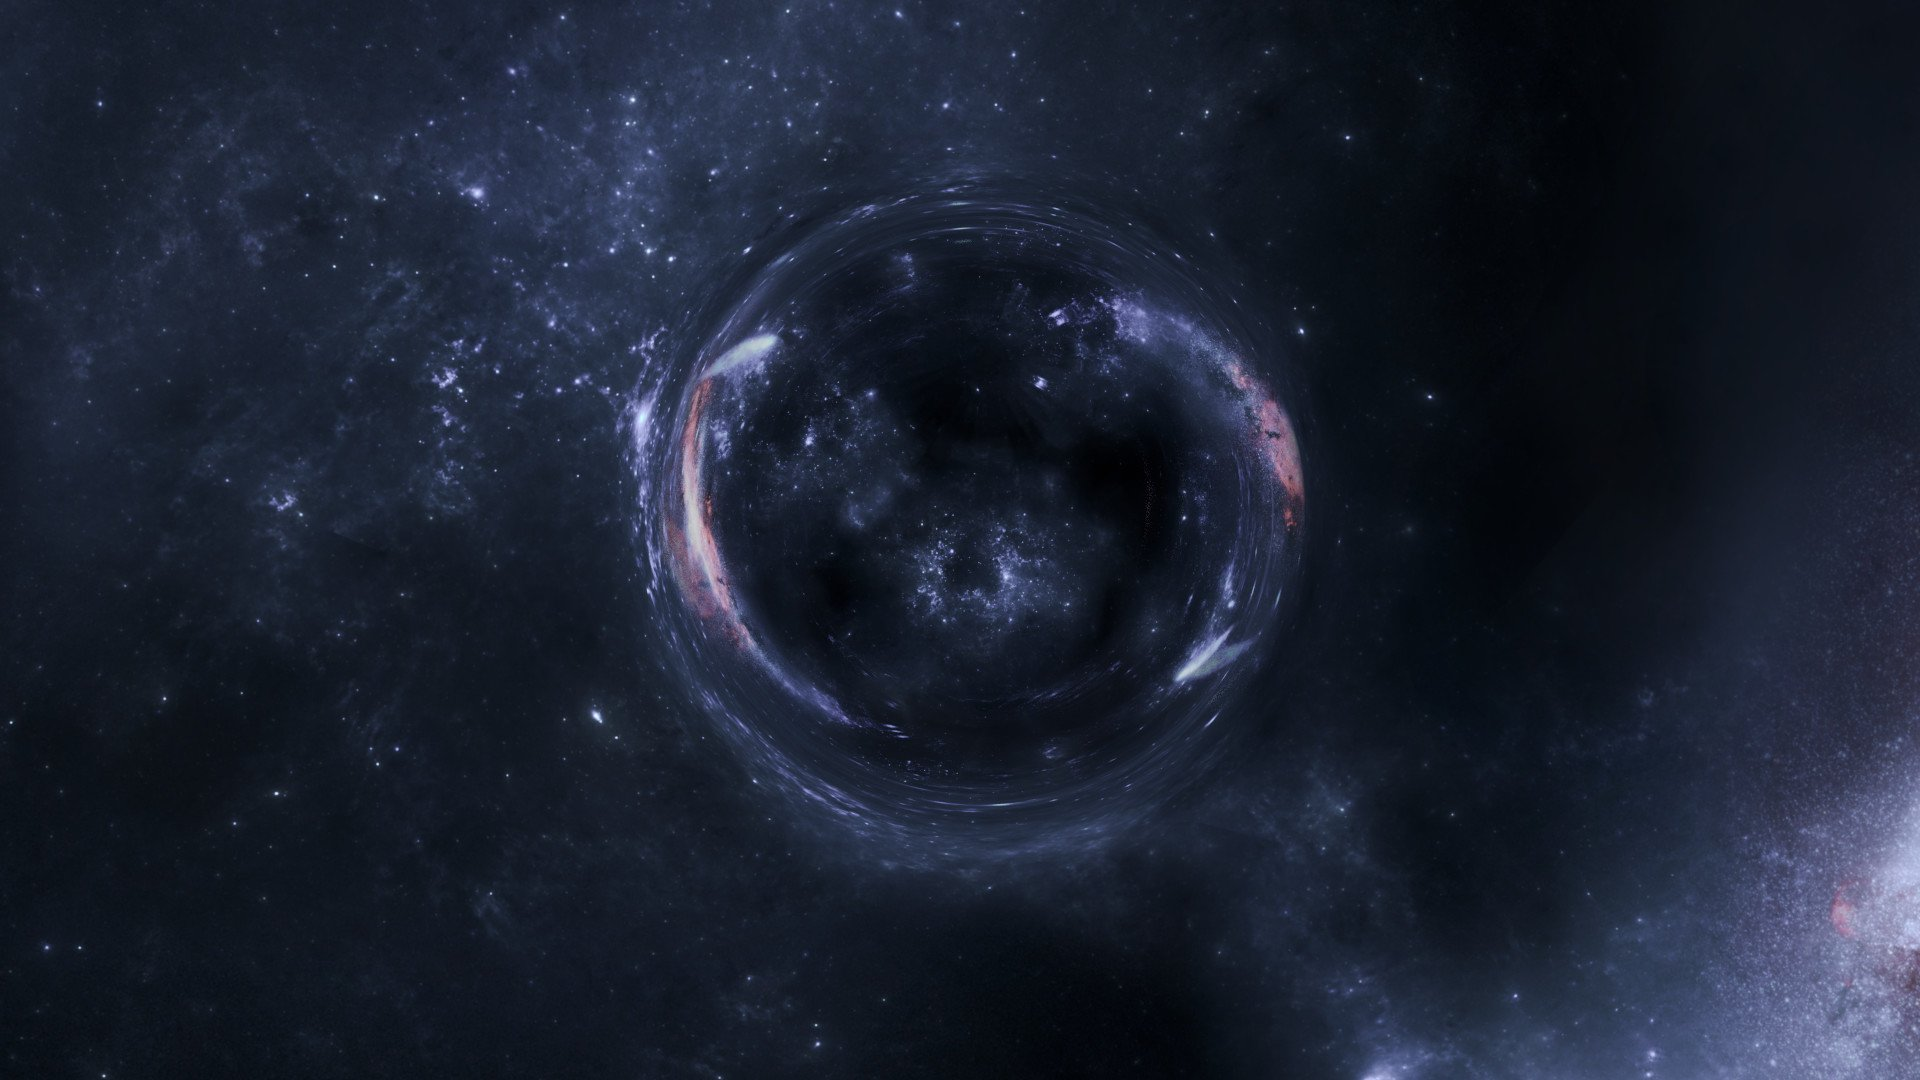 Interstellar wormhole HD Wallpaper